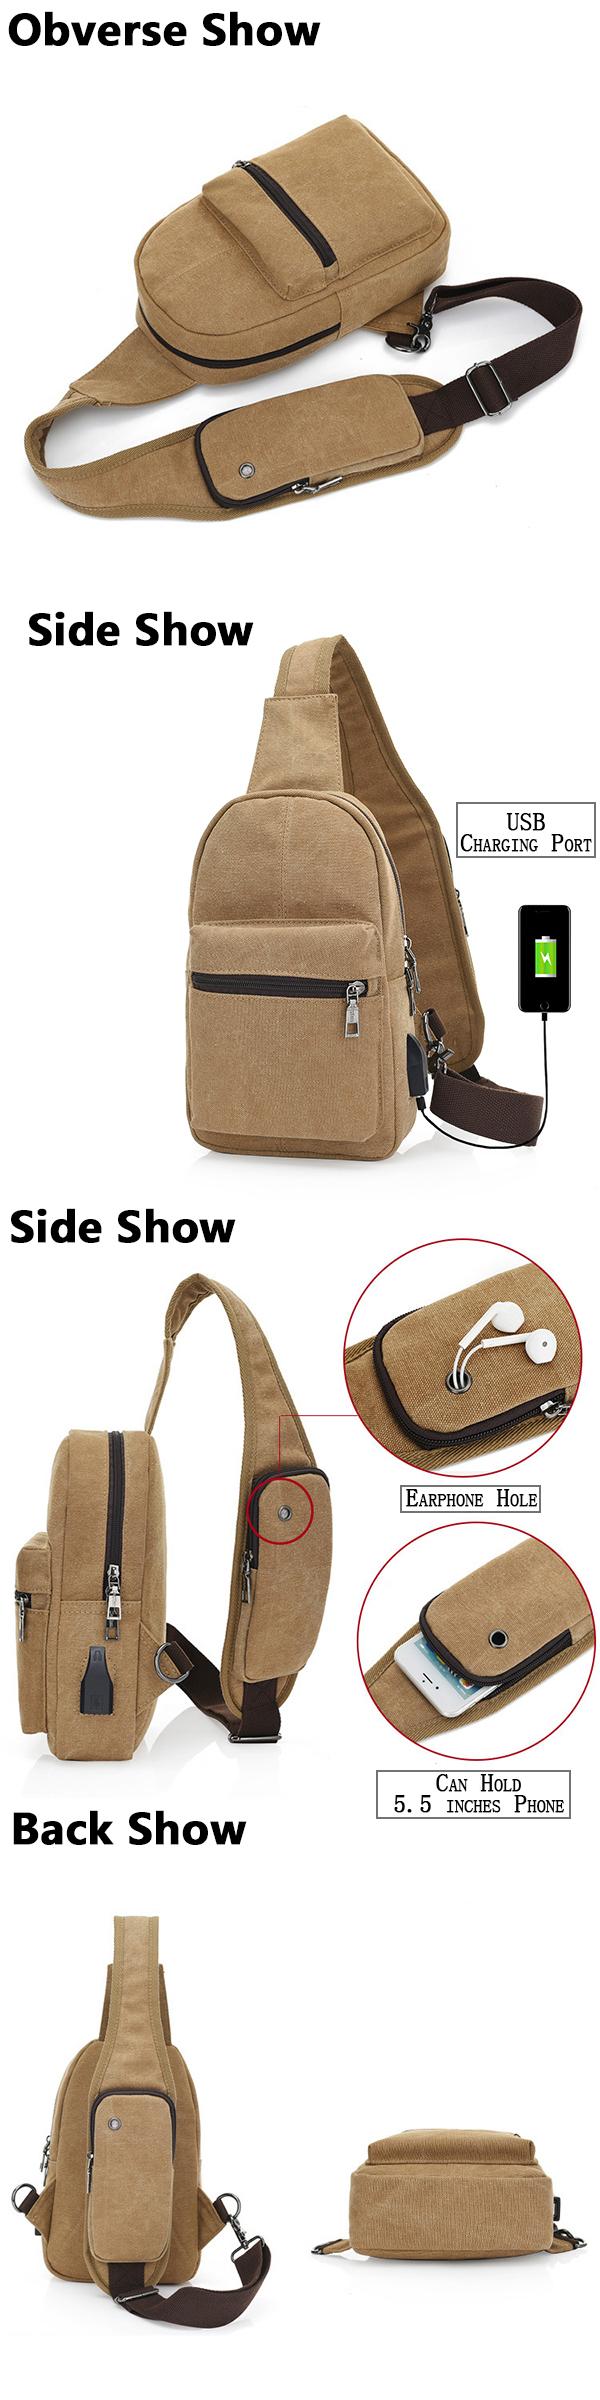 Men Canvas External USB Charging Function Crossbody Bag Leisure Retro Sports Chest Bag